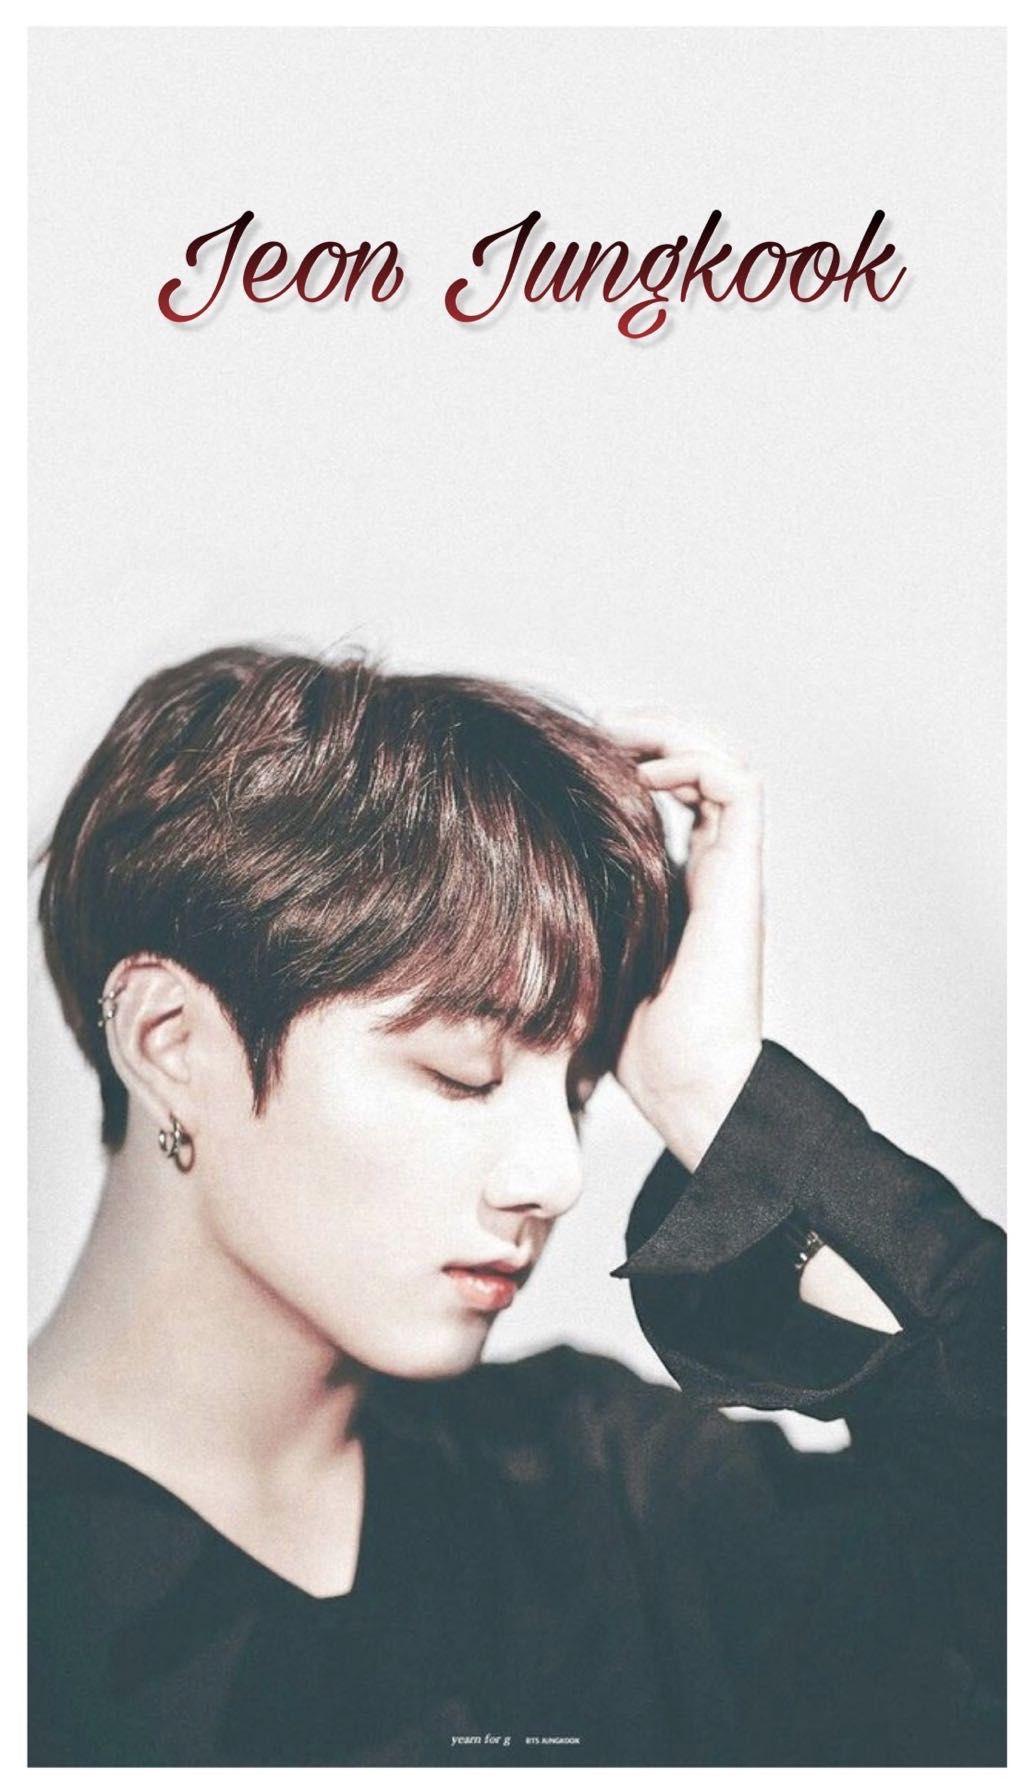 Jung Kook Bts Phone Wallpapers Top Free Jung Kook Bts